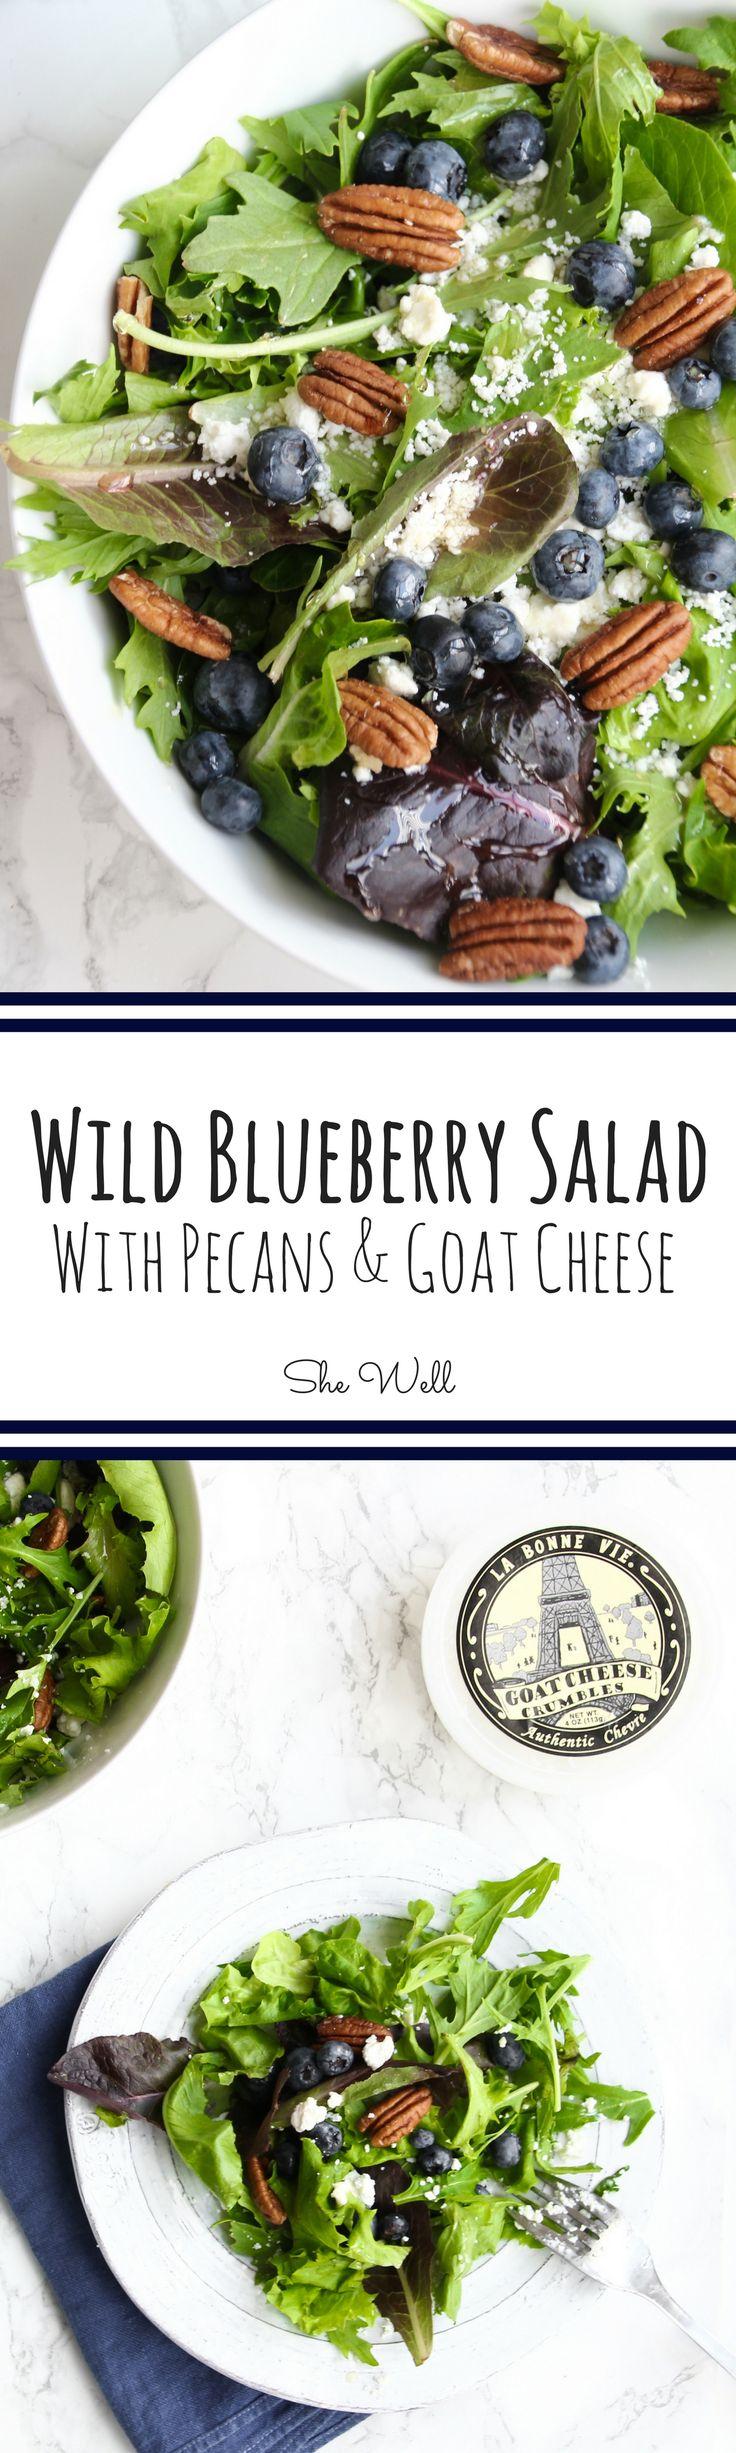 Wild Blueberry Salad